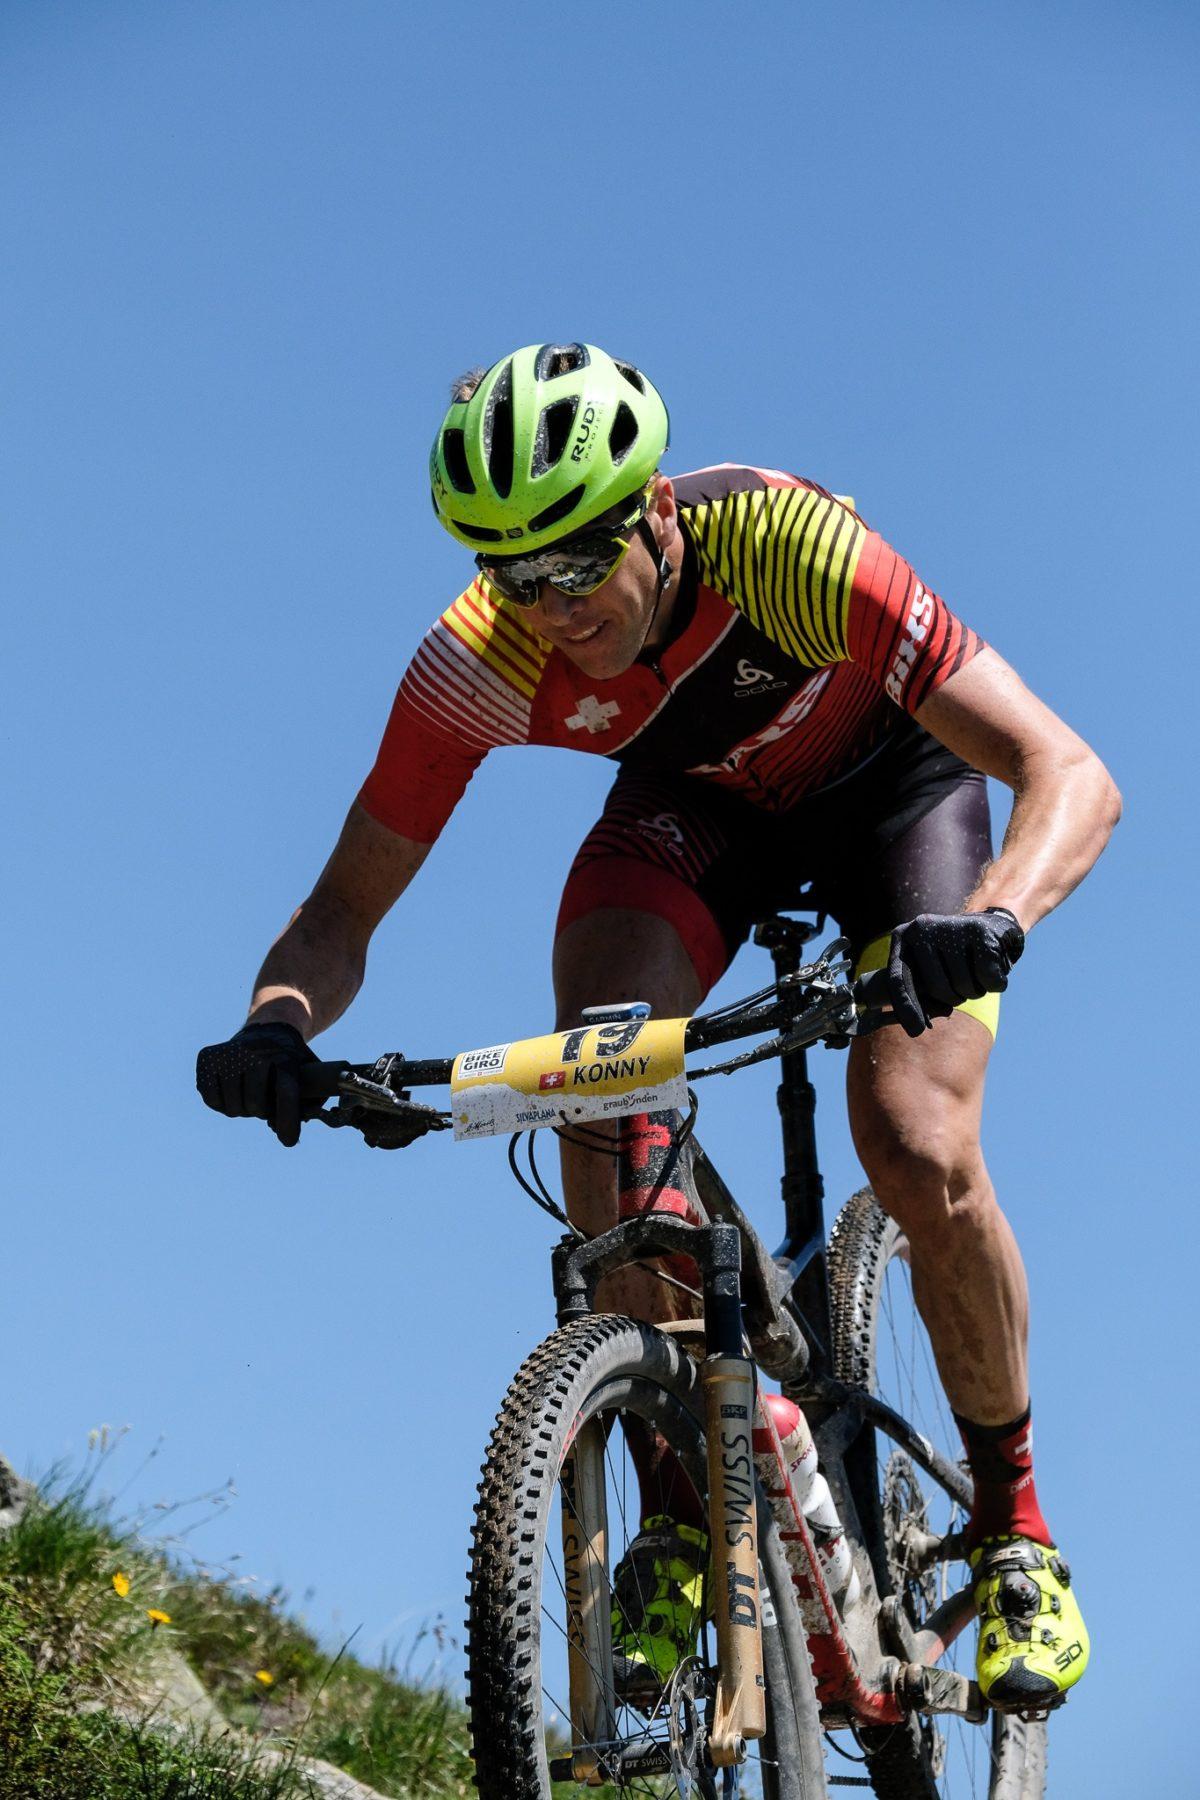 4ter Gesamtrang und 5ter Tagesrang auf der 2. Etappe des Engadin Bike Giro's.